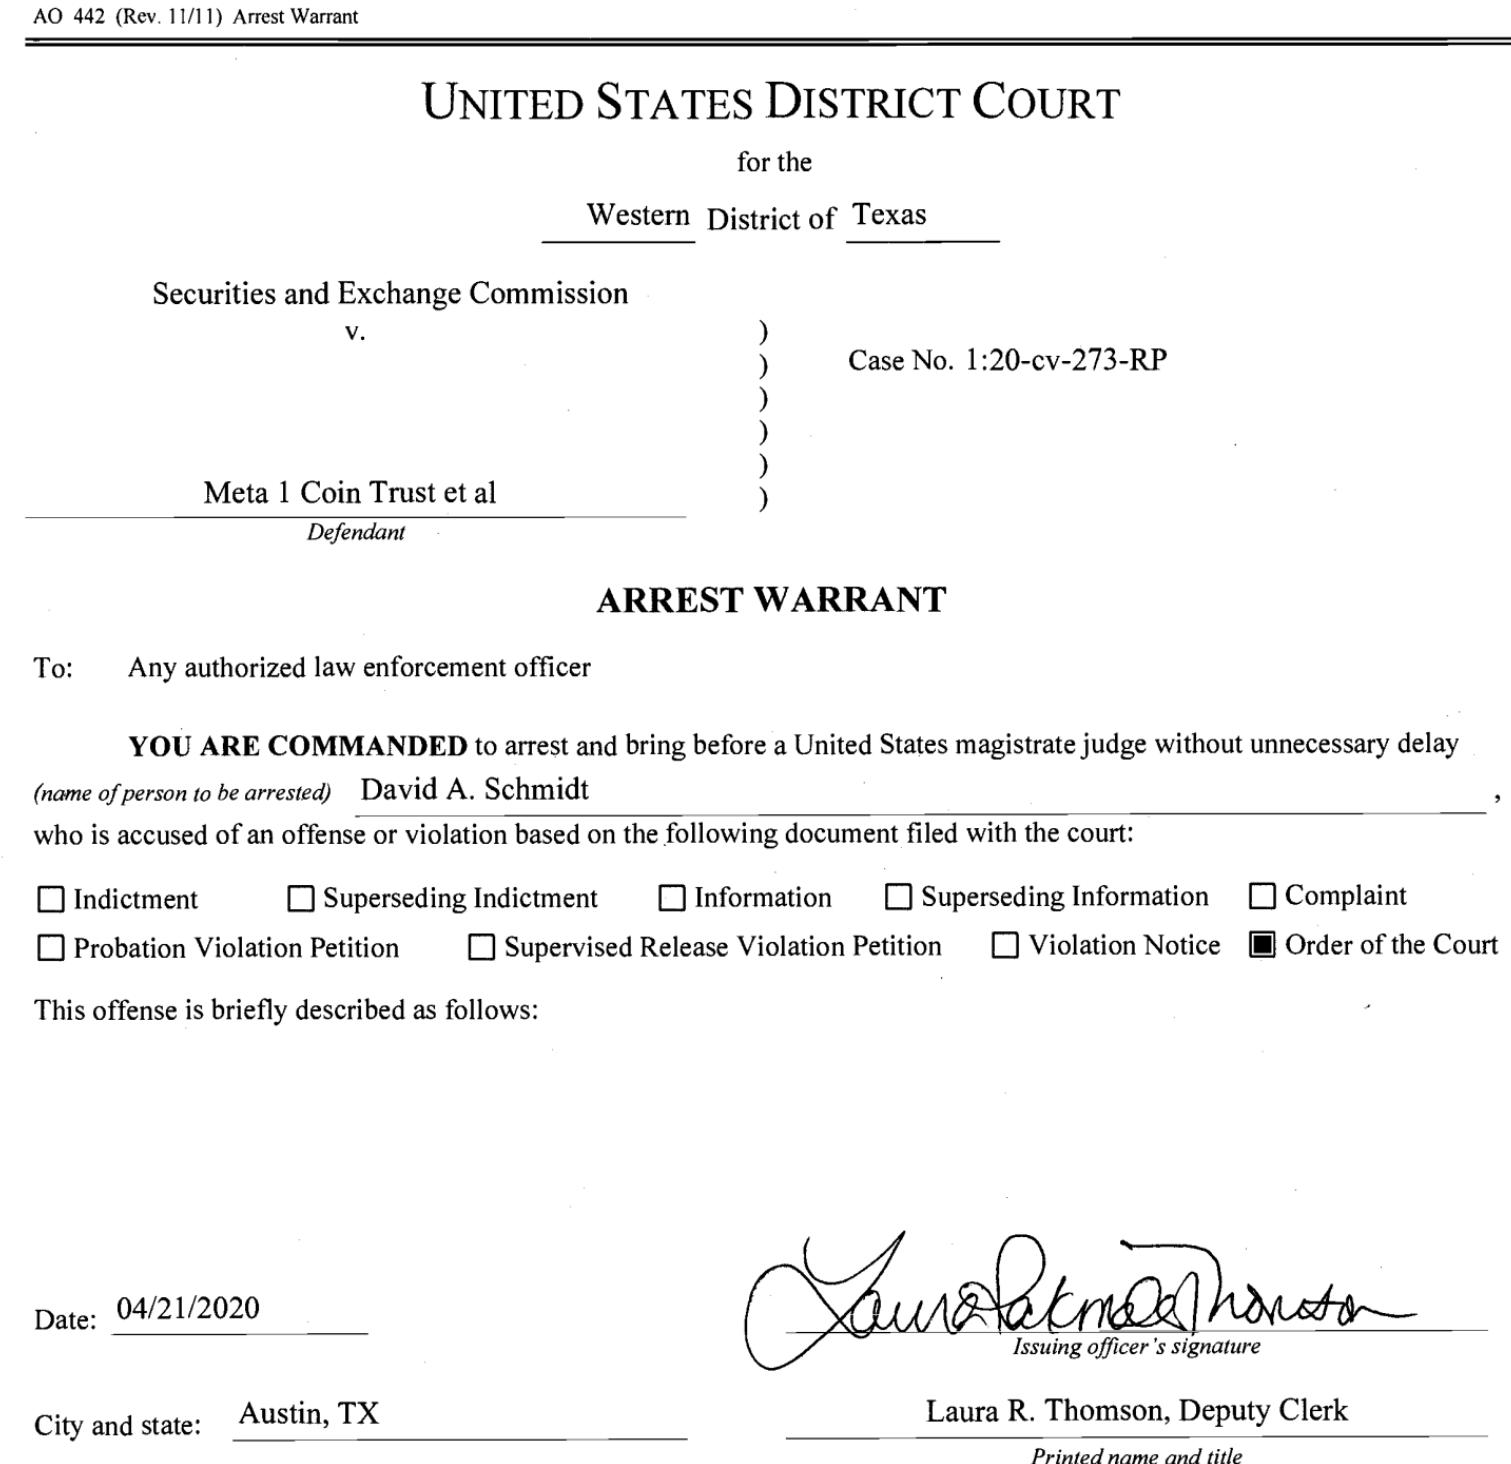 schmidt - Dave Schmidt Phone Number and Arrest Warrant Dave_s10